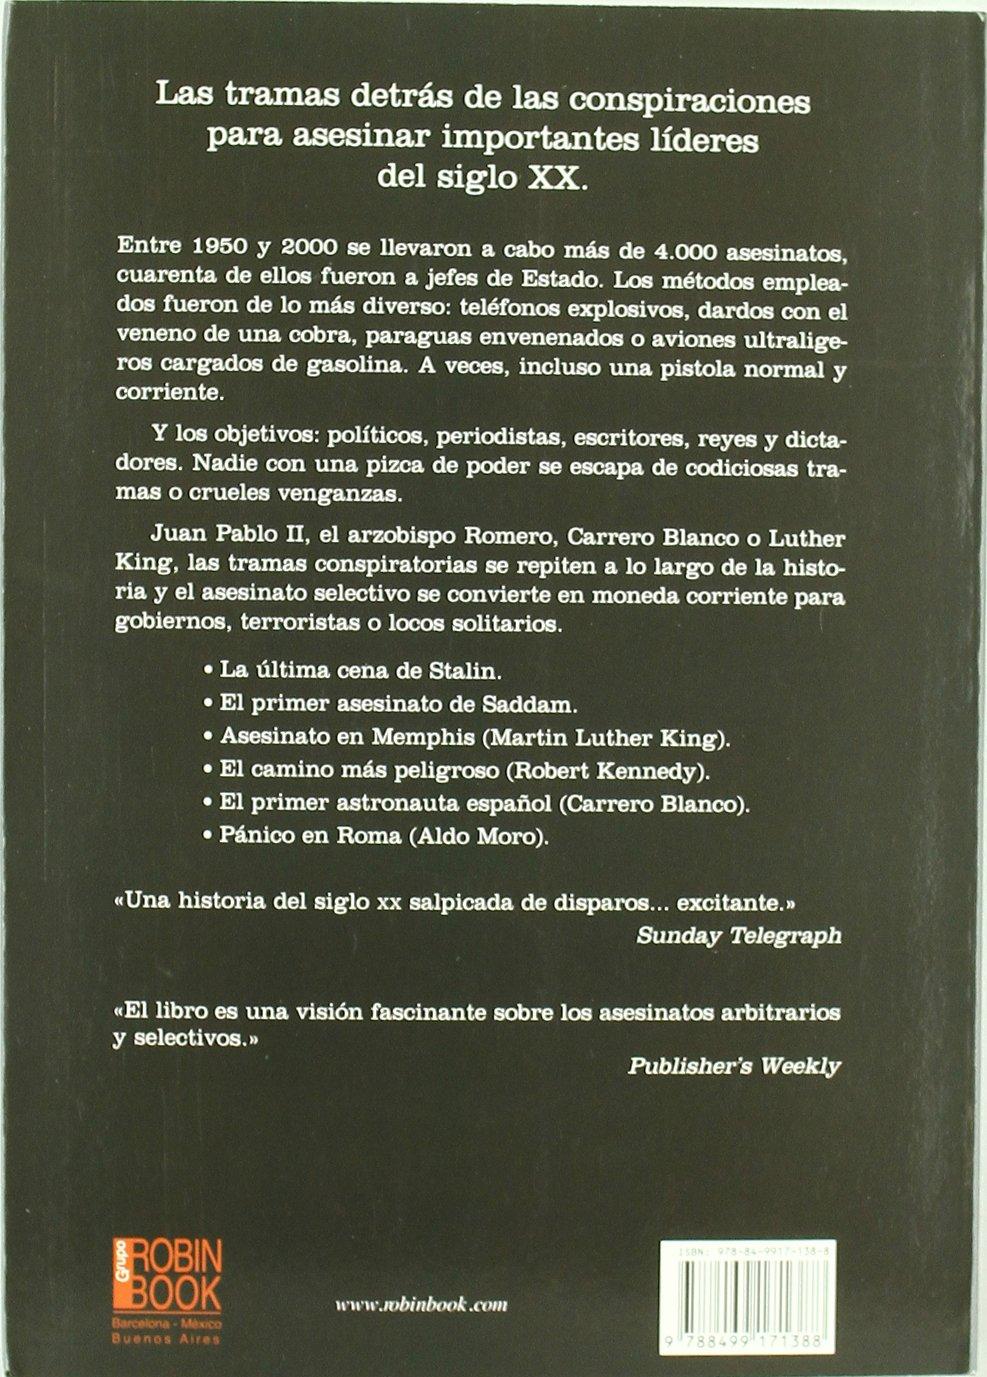 LIBRO NEGRO DEL SIGLO XX, EL. Una crónica criminal de la historia: 9788499171388: Amazon.com: Books